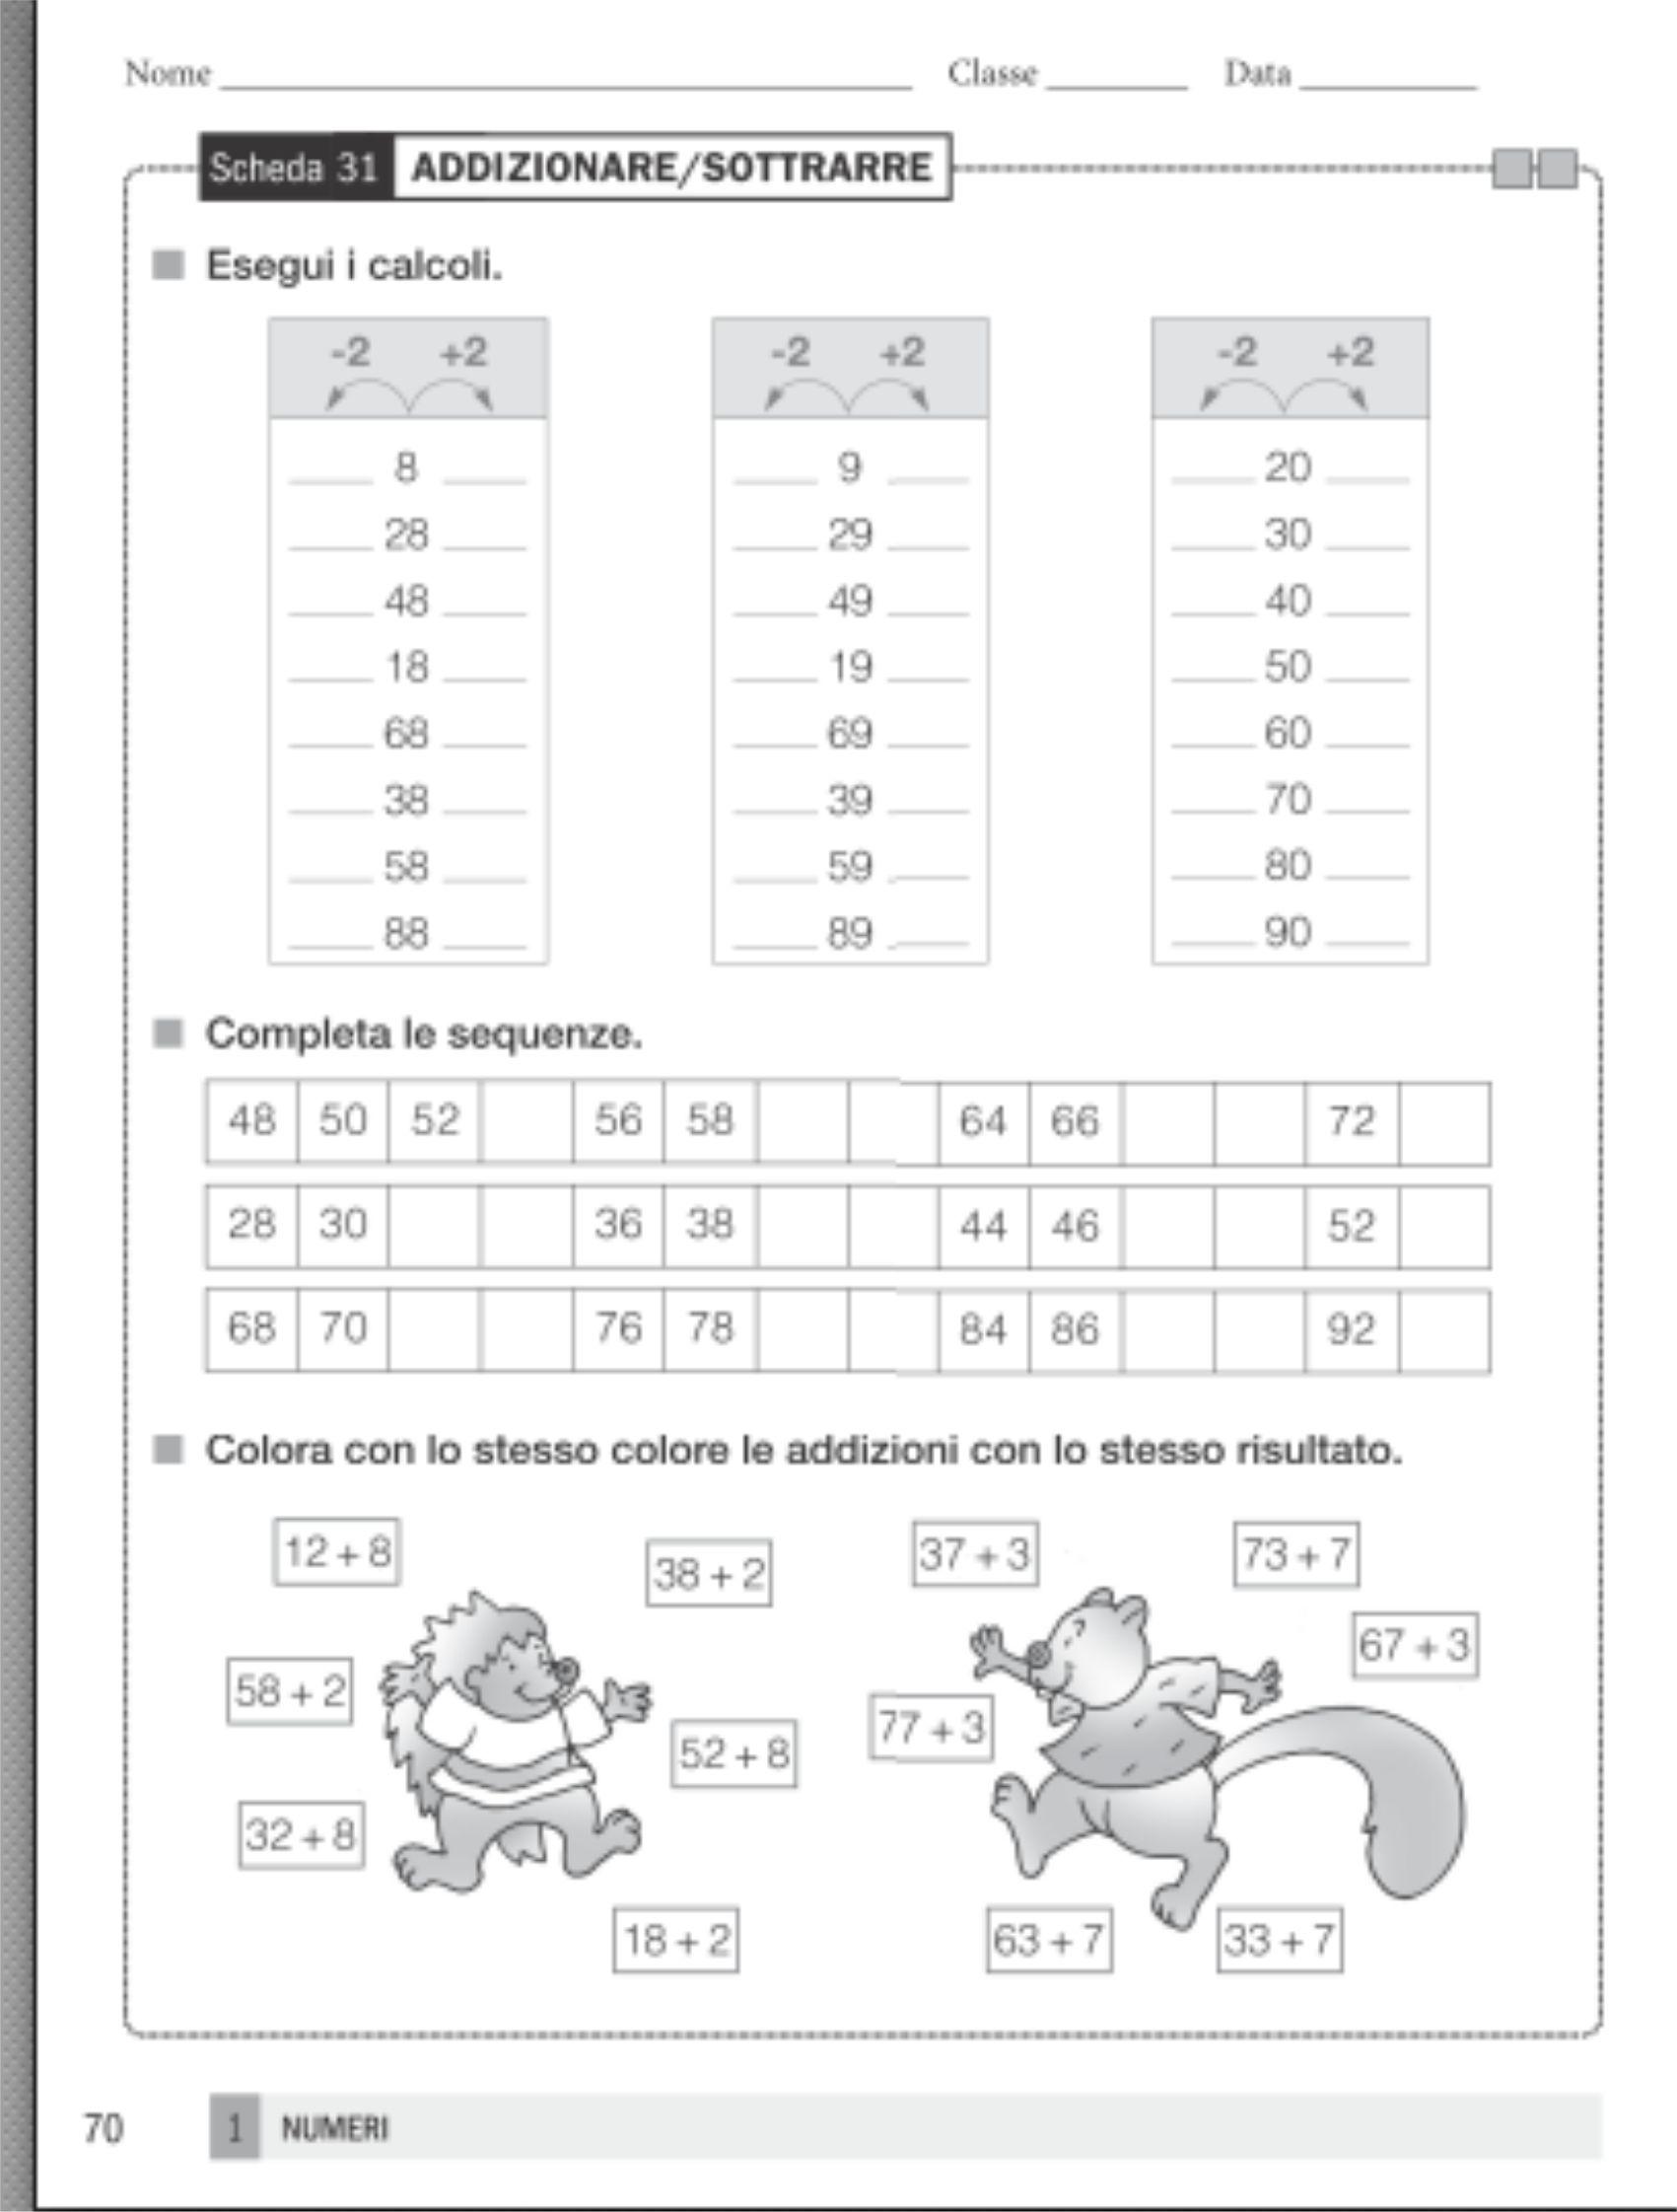 La Scuola: Classe seconda, matematica - schedari operativi